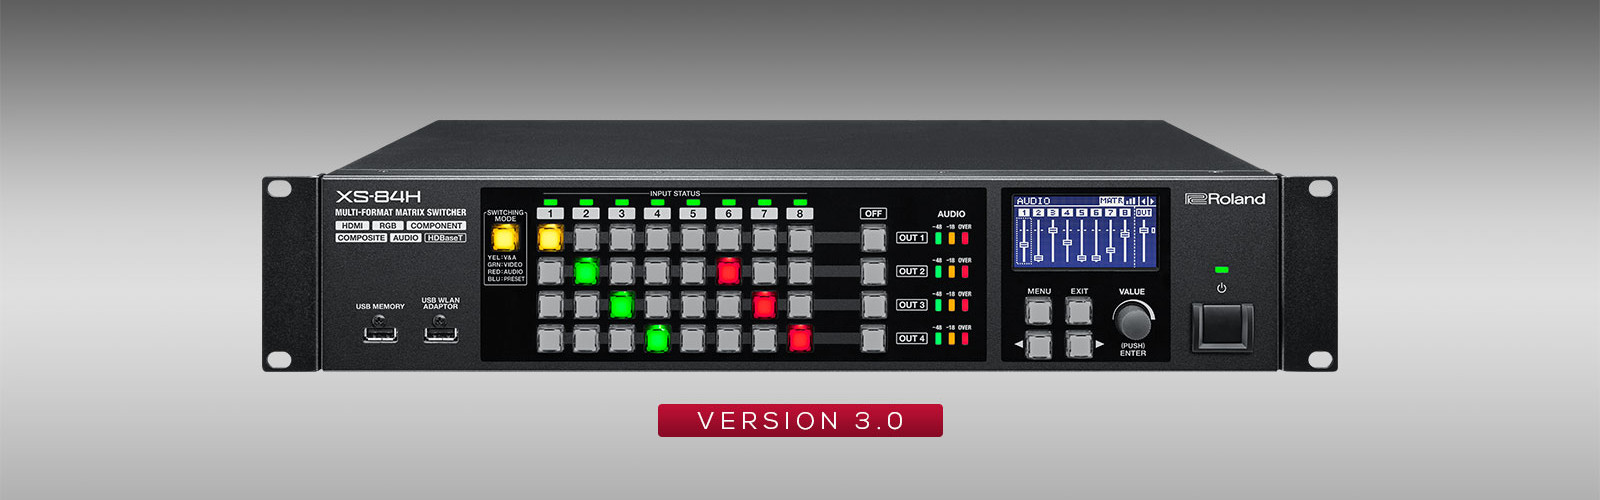 XS Series Version 3.0